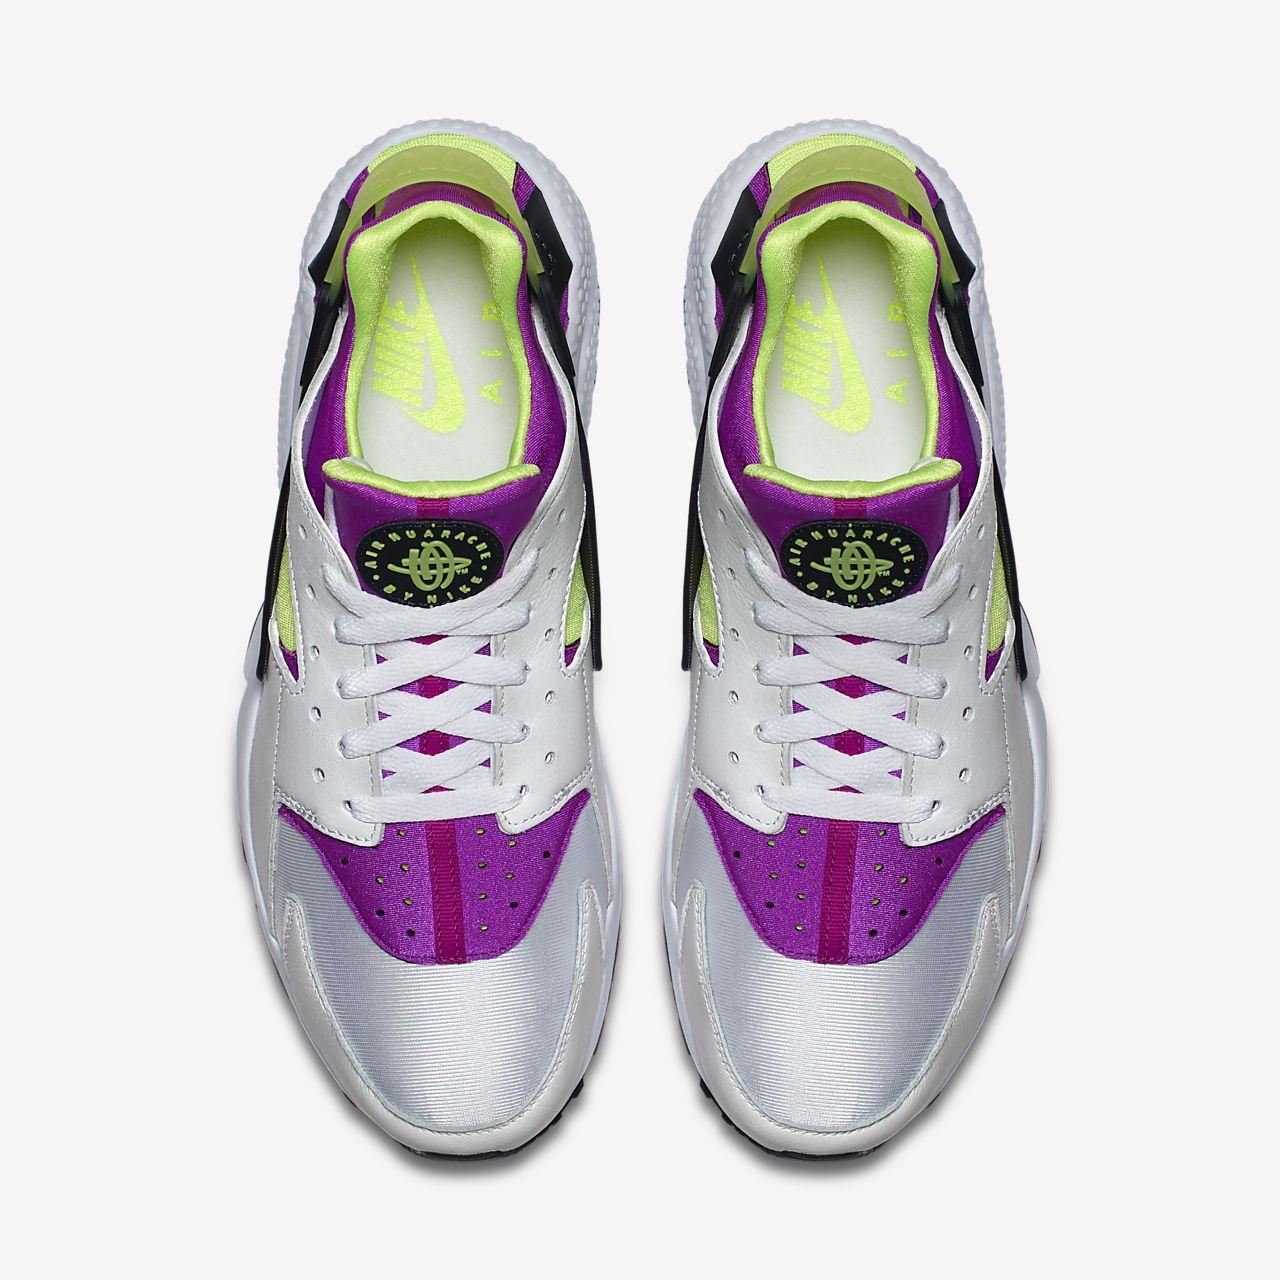 save off 5a3b4 6f3dc ... Skon Nike Air Huarache  91 QS för män